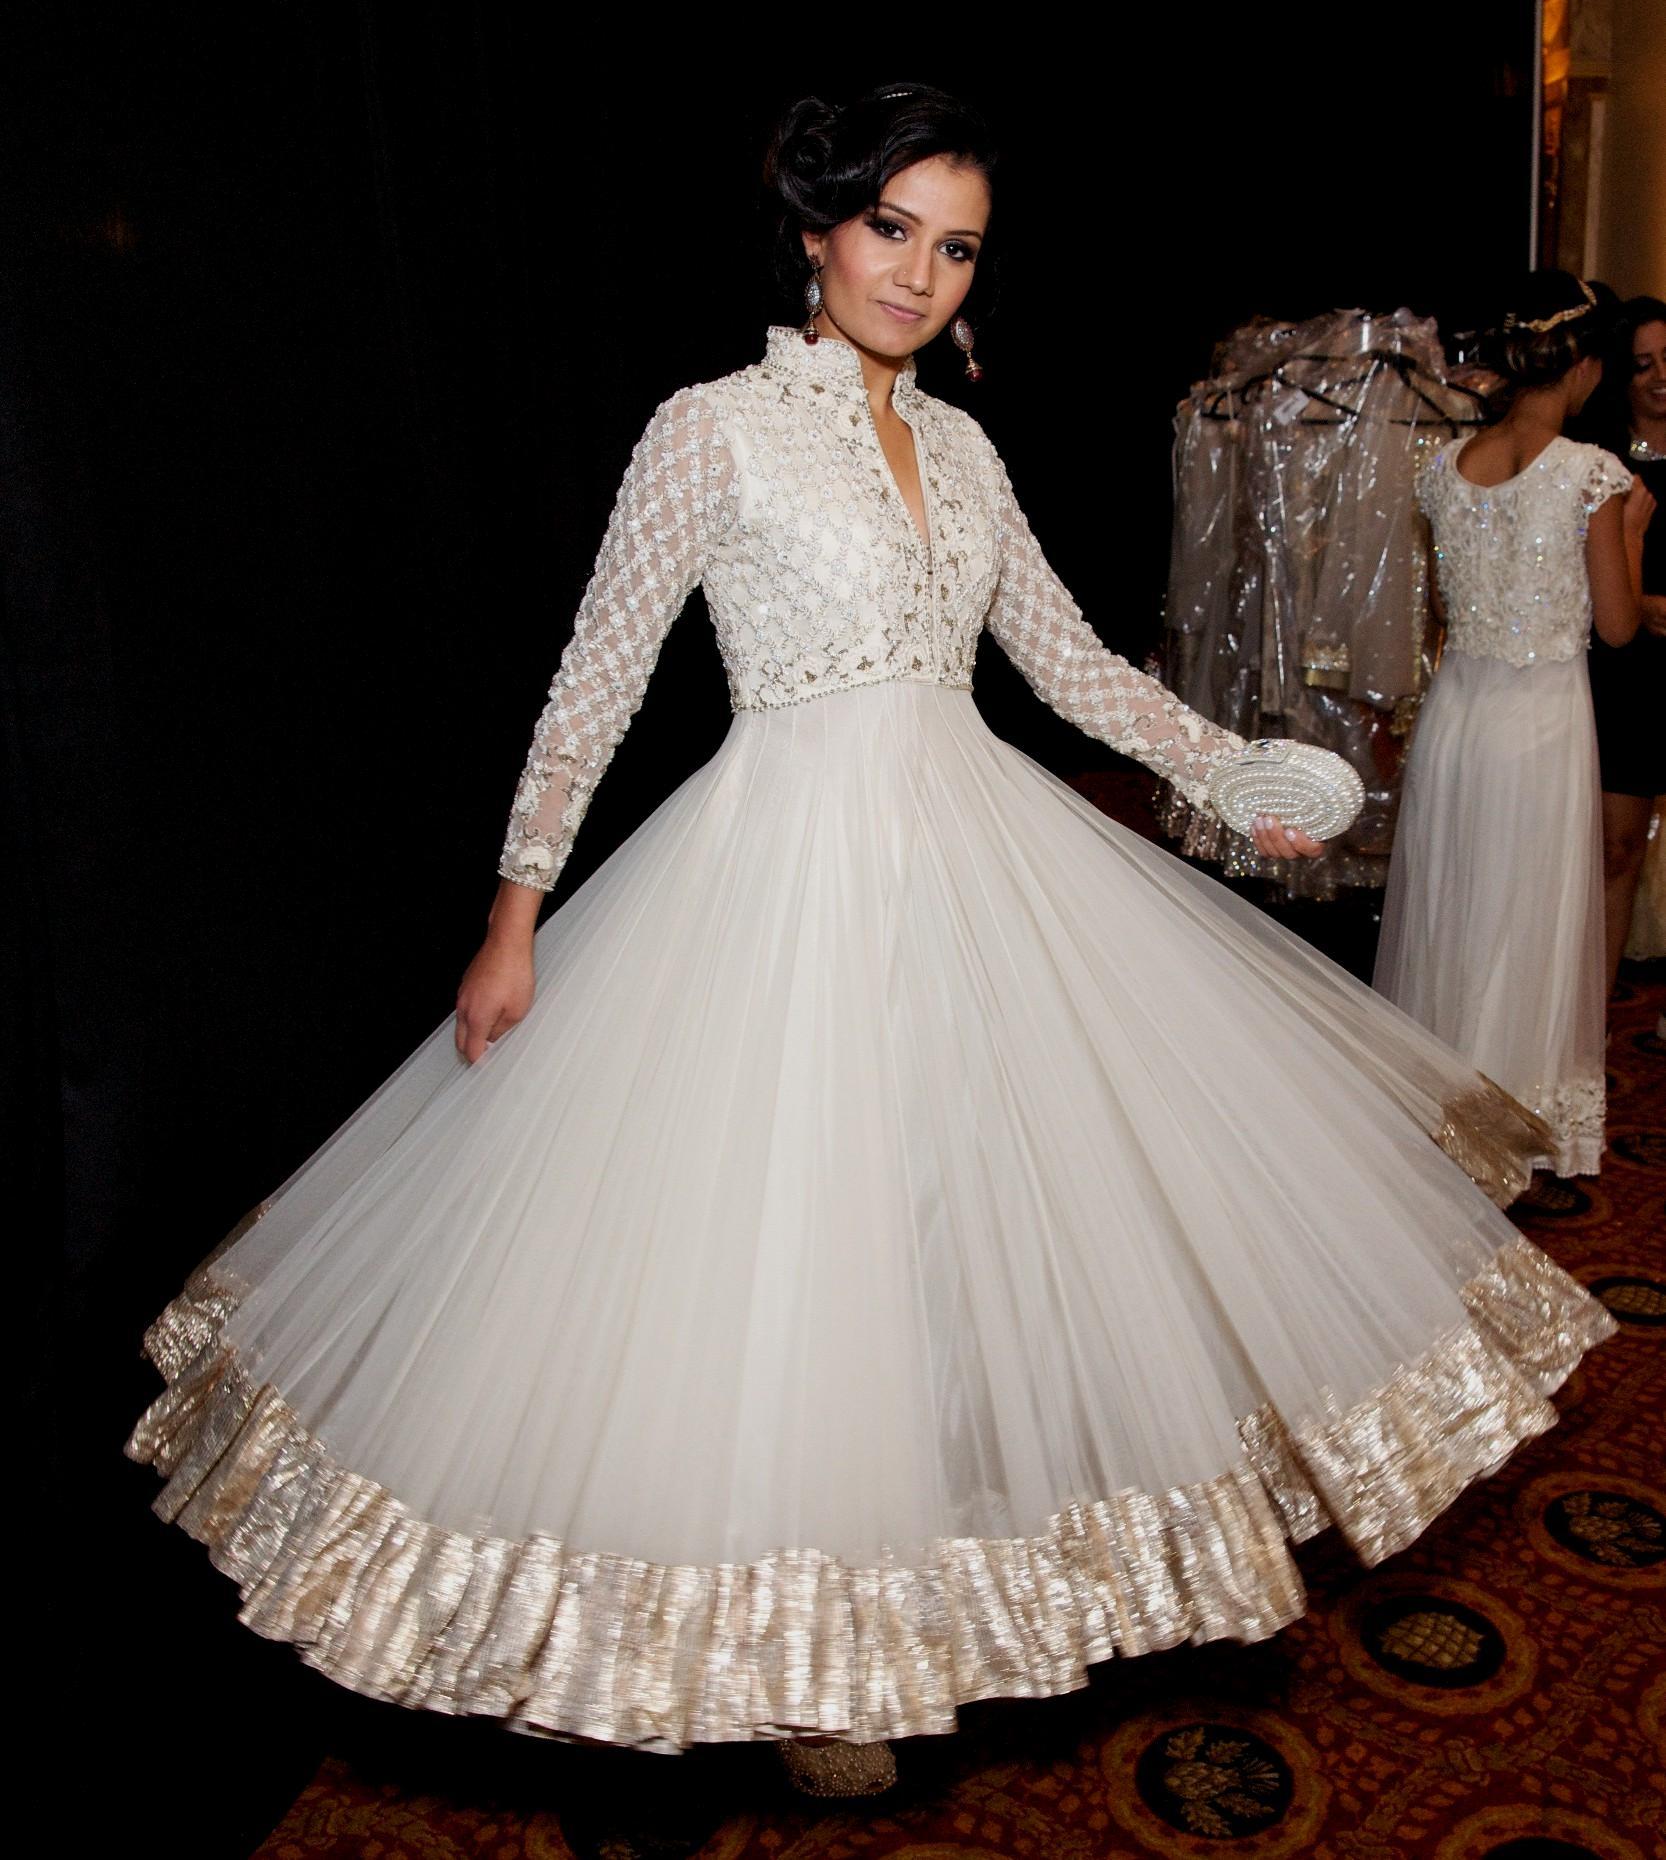 western wedding dresses for womens photo - 1